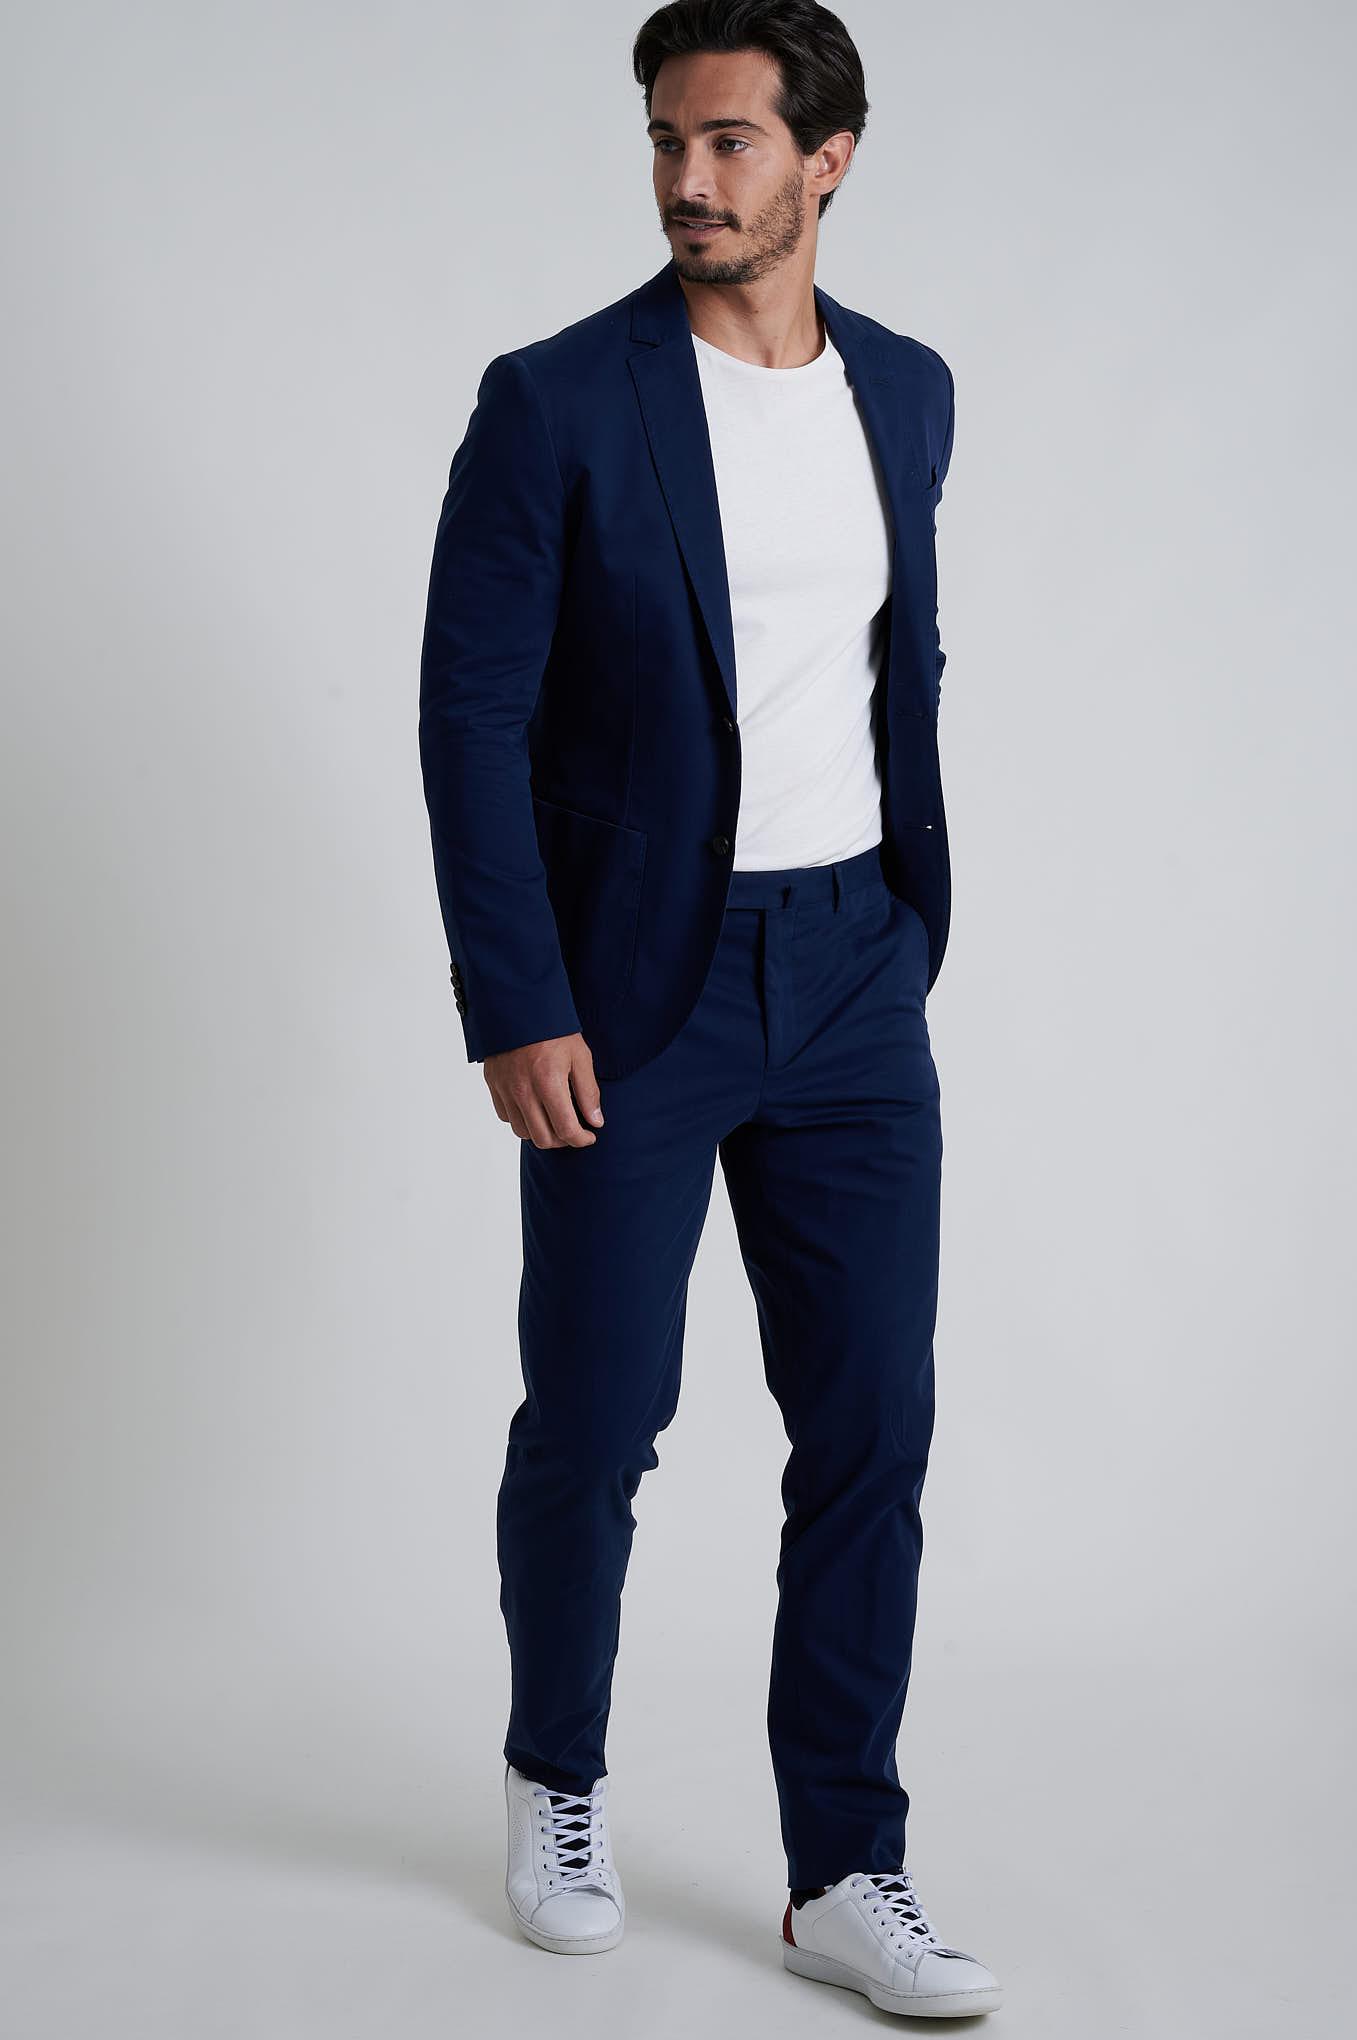 Suit Dark Blue Formal Man